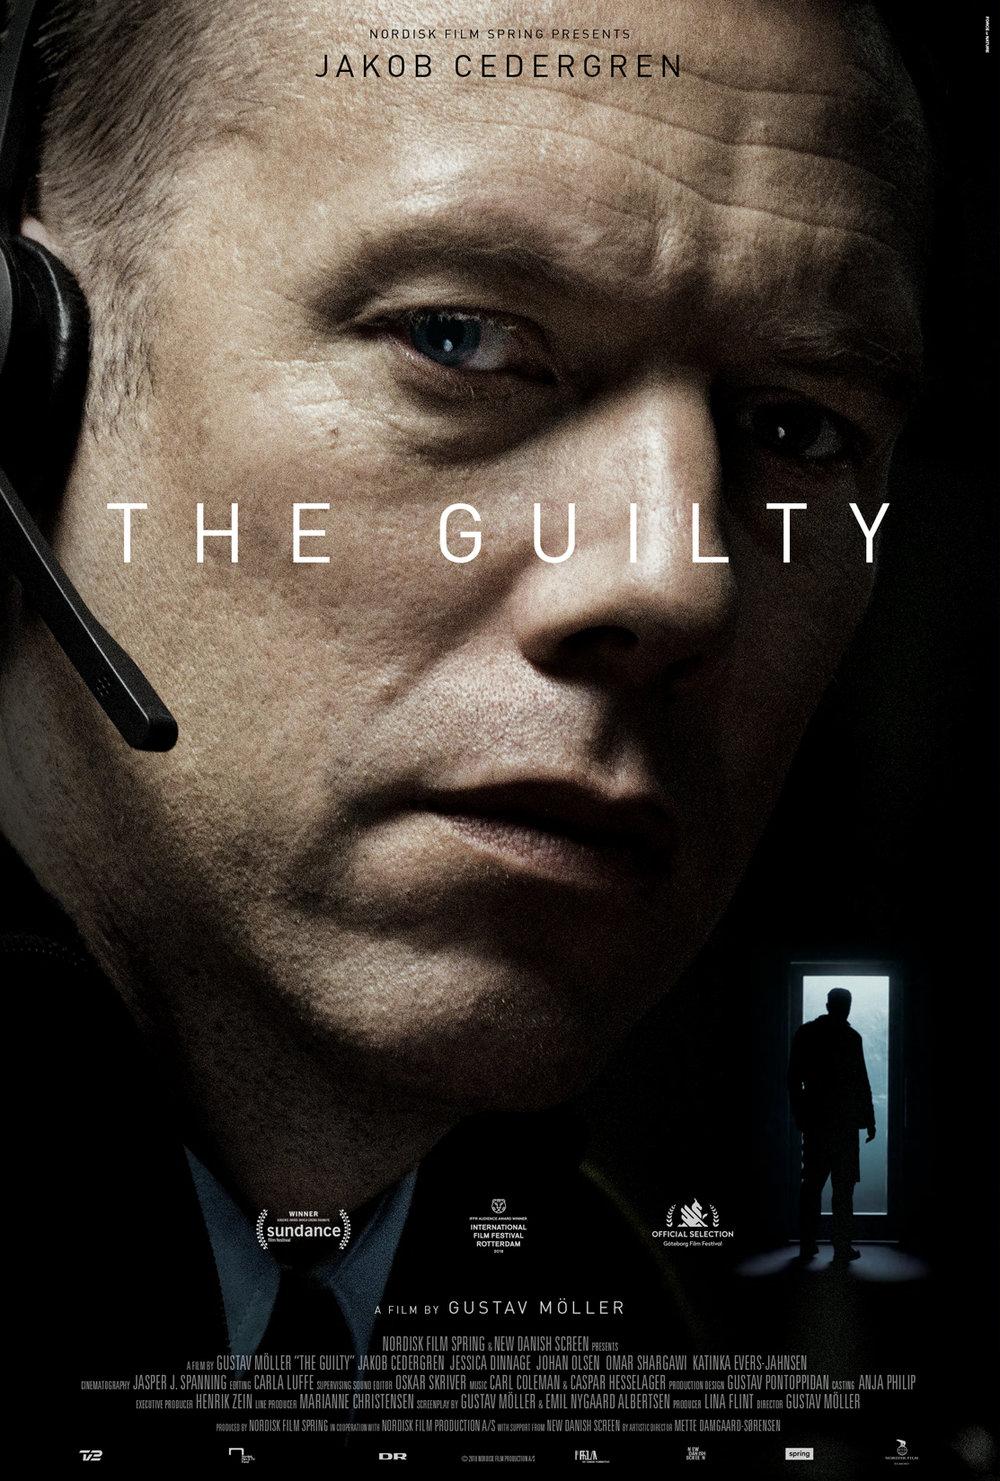 TheGuilty-poster685x1015.jpg